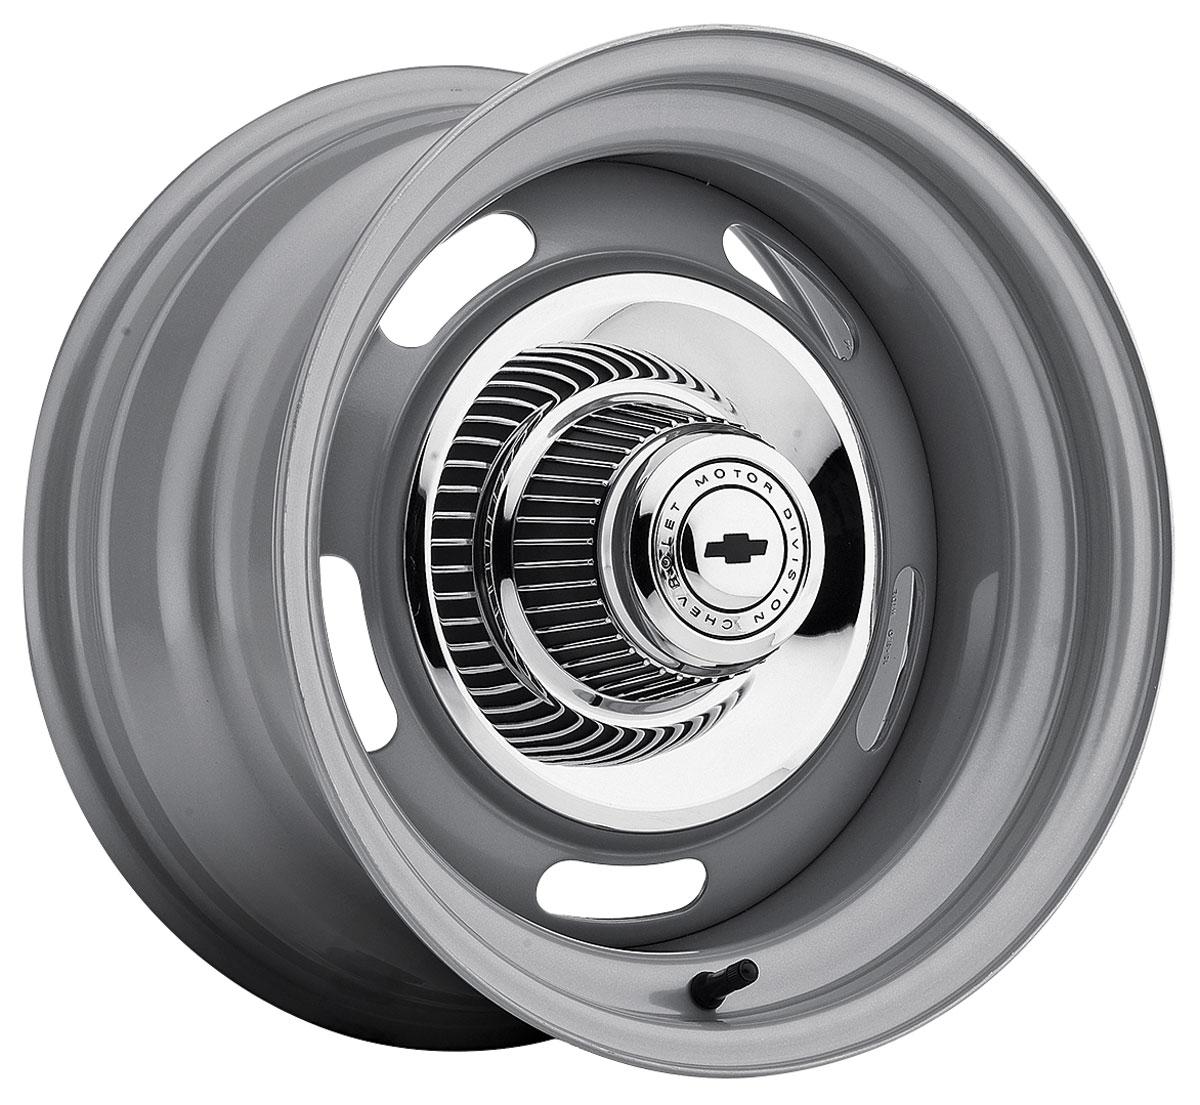 "Rally Wheel, Silver, 15"" X 7"", 4-1/4"" Backspacing"